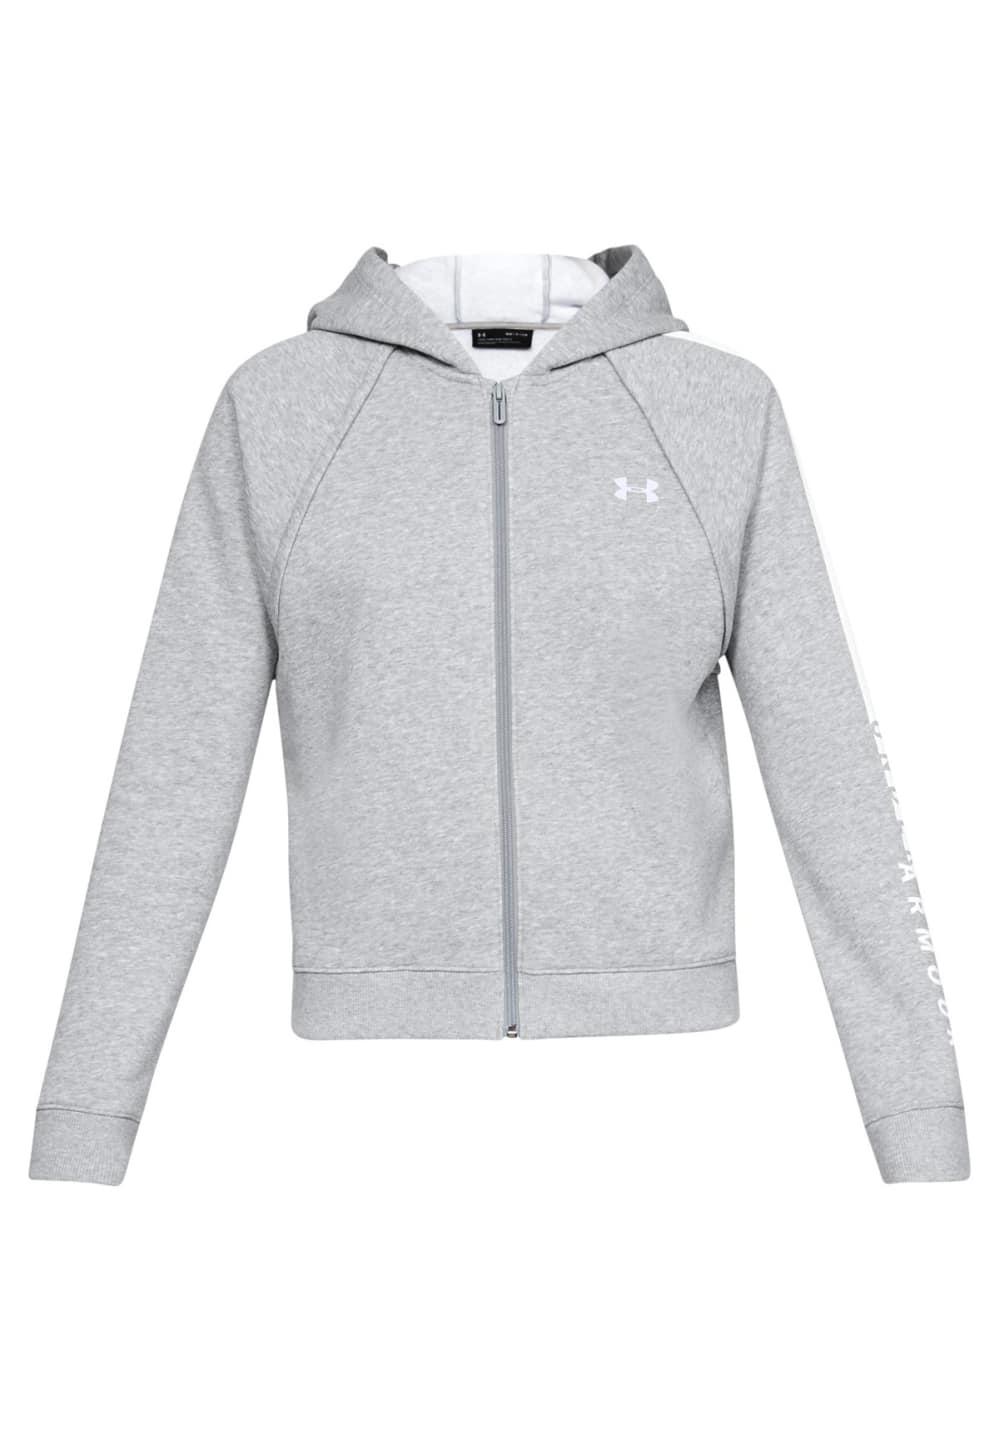 Under Armour Rival Fleece Full Zip Hoodie - Sweatshirts   Hoodies für Damen  - Grau günstig 47e1368dd7